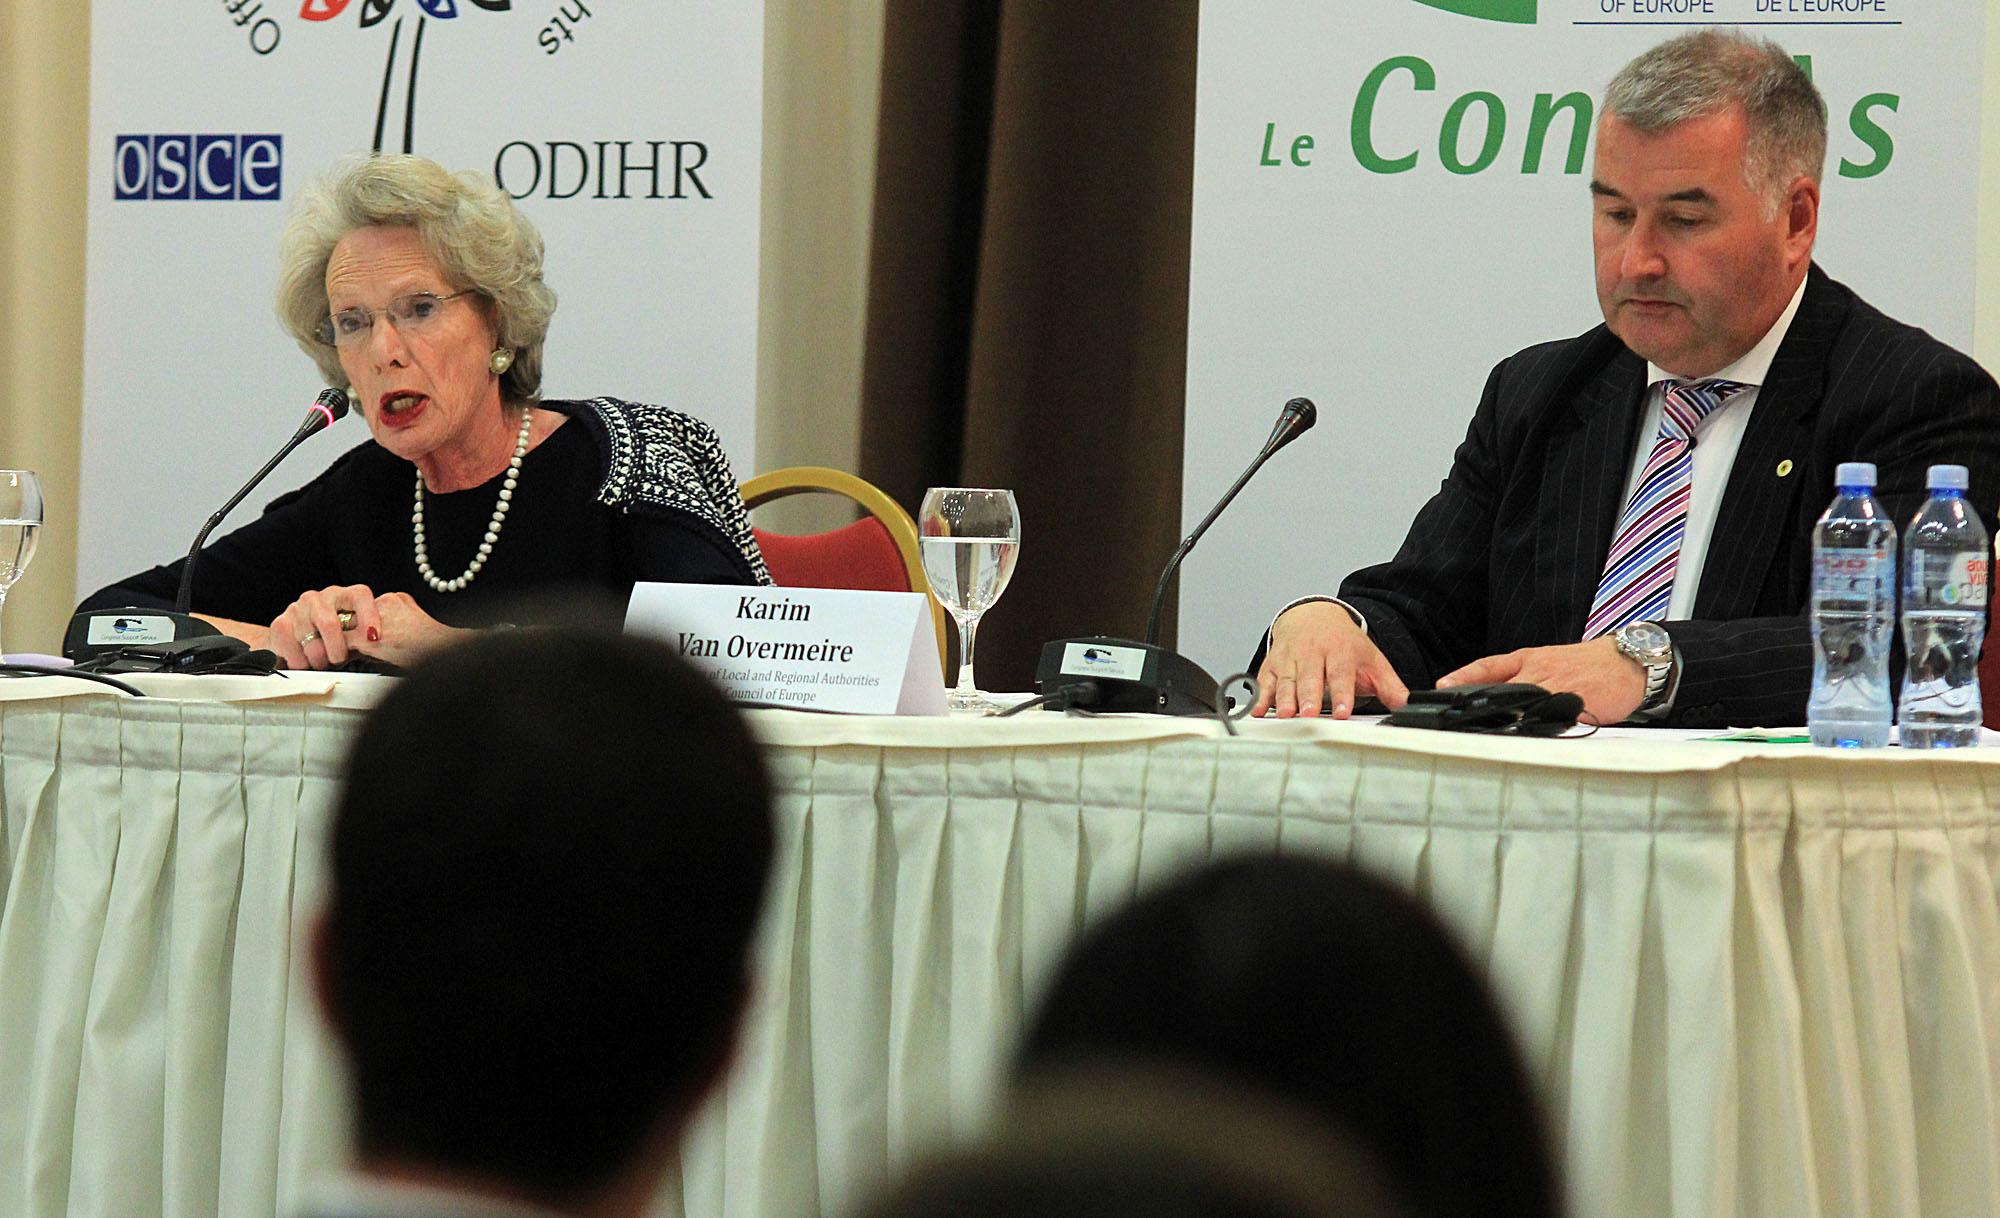 OSCE/ODIHR: Elections marked a democratic advance